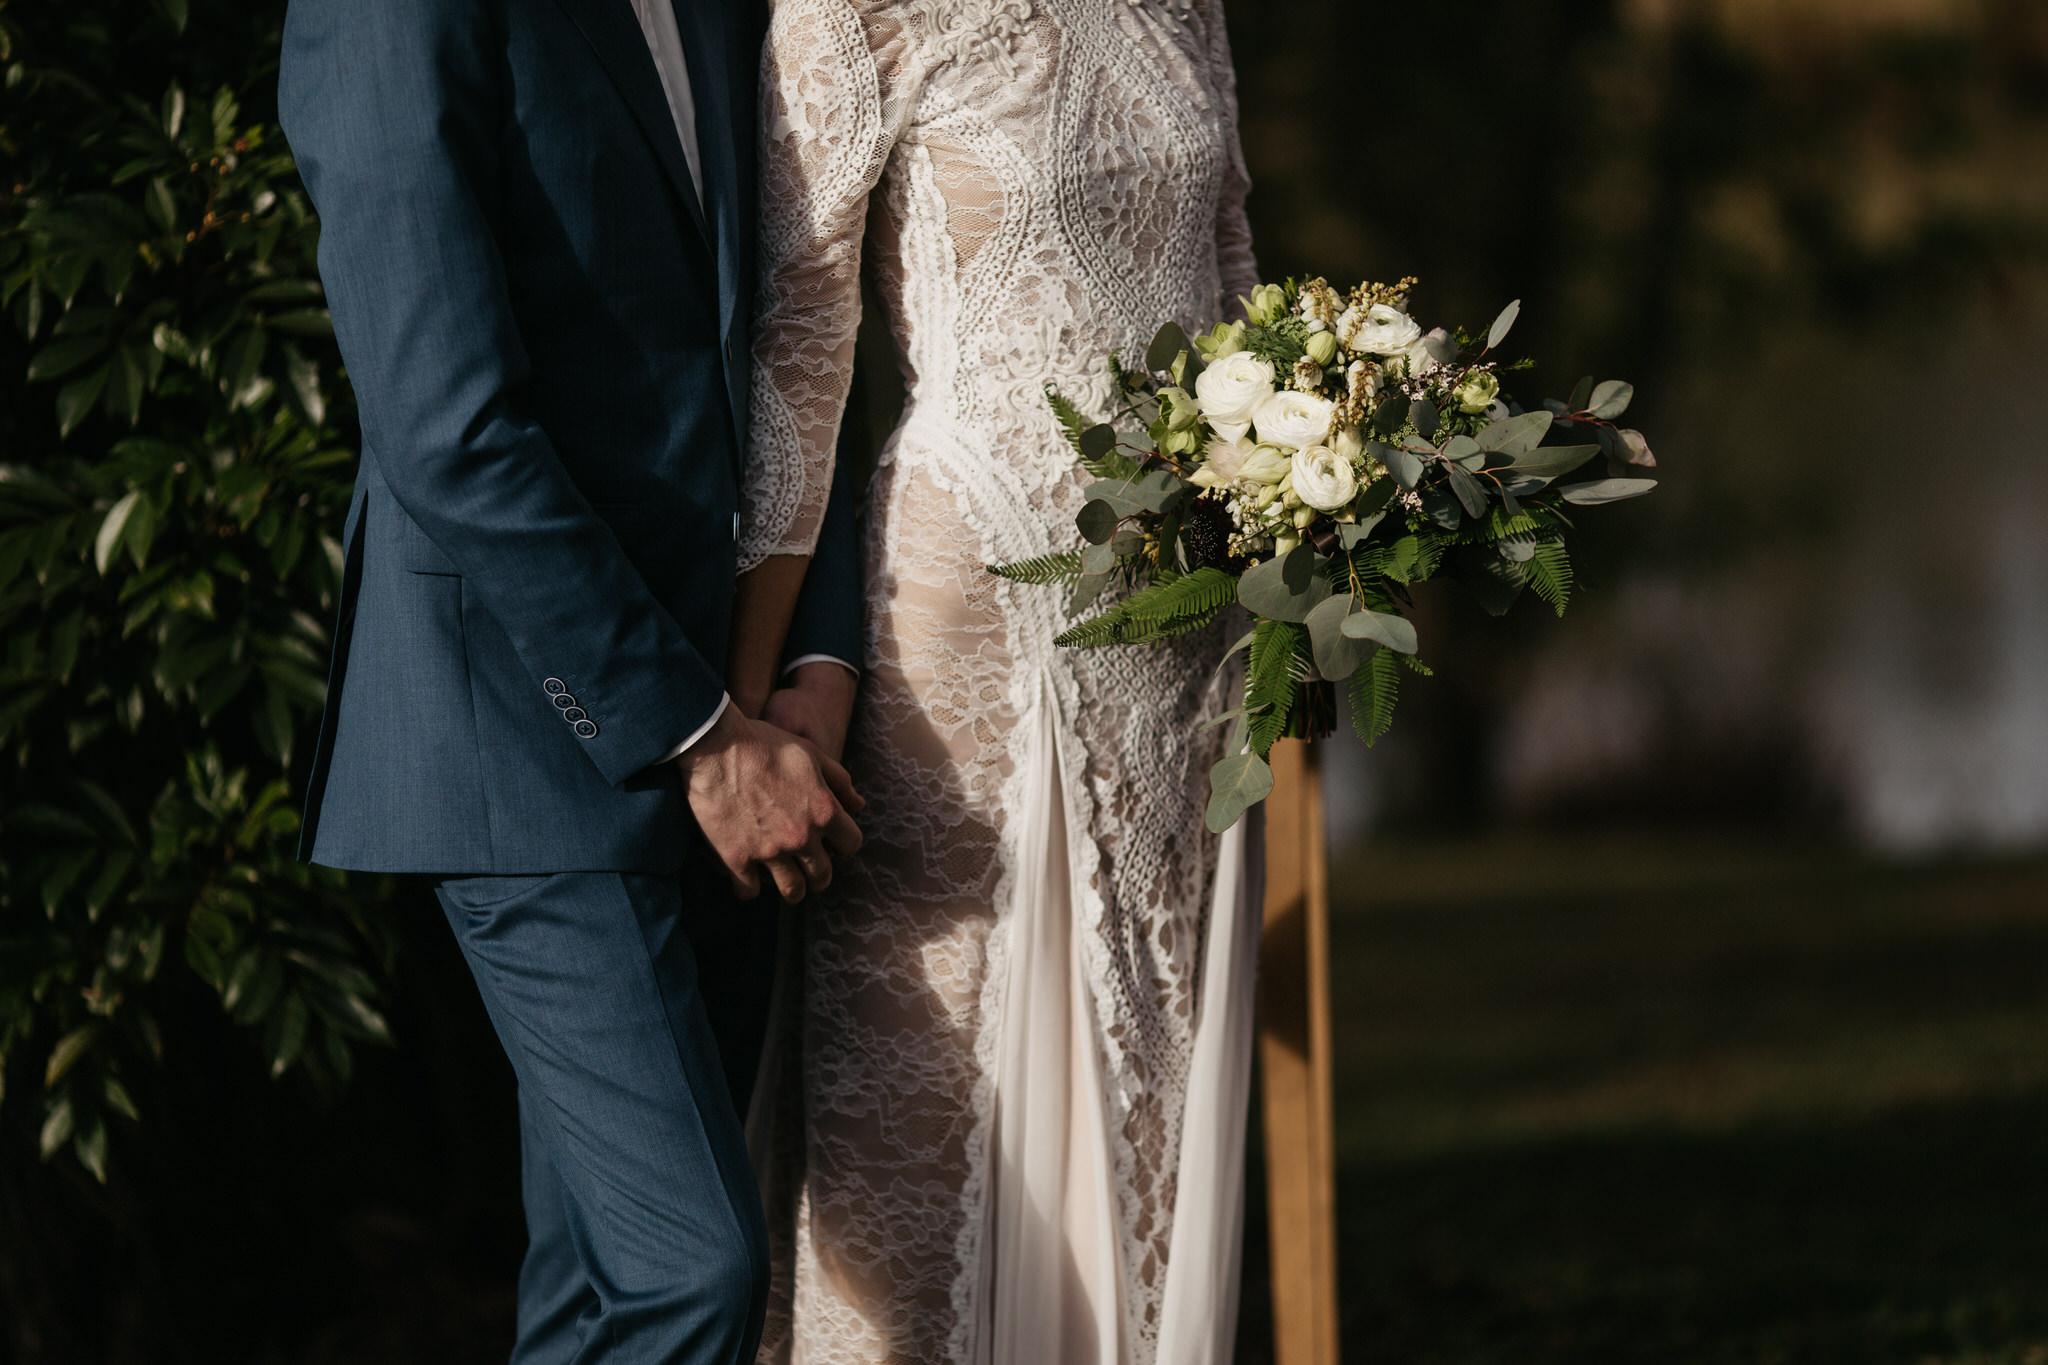 046_SBA-Jen-Tom-Wedding-165.jpg